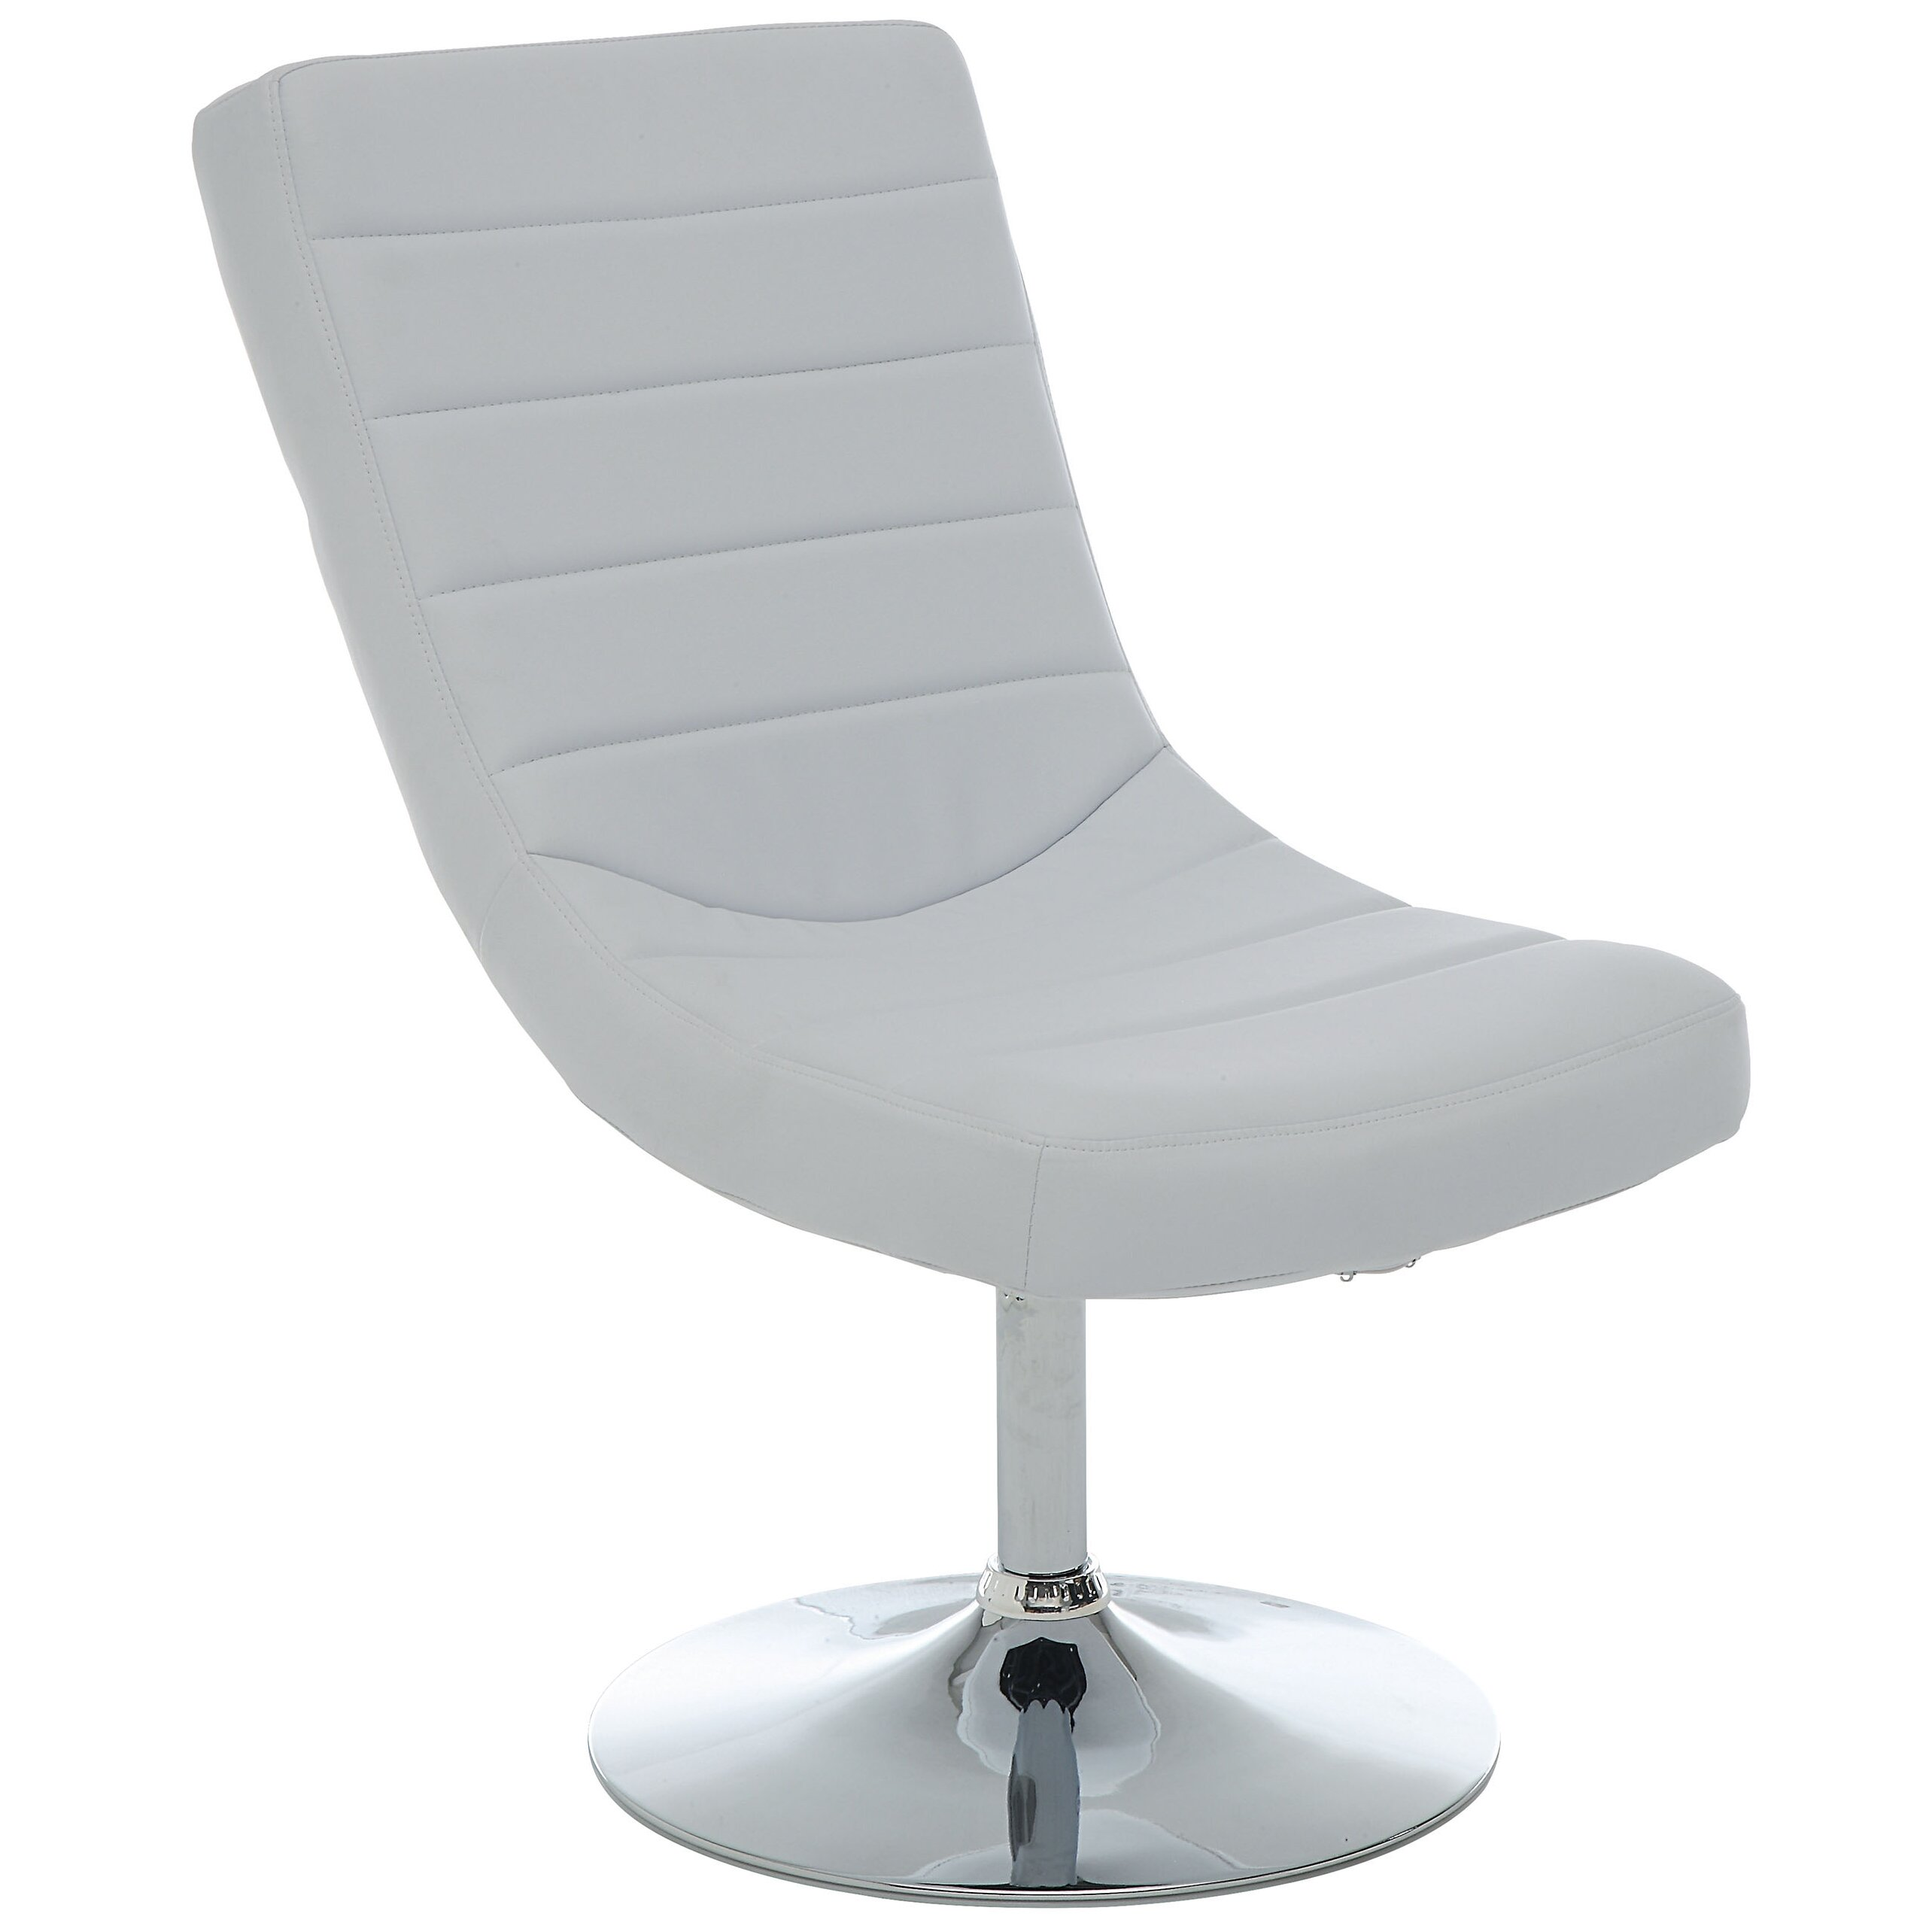 Zipcode Design Gretchen Lounge Chair and Ottoman Reviews Wayfair